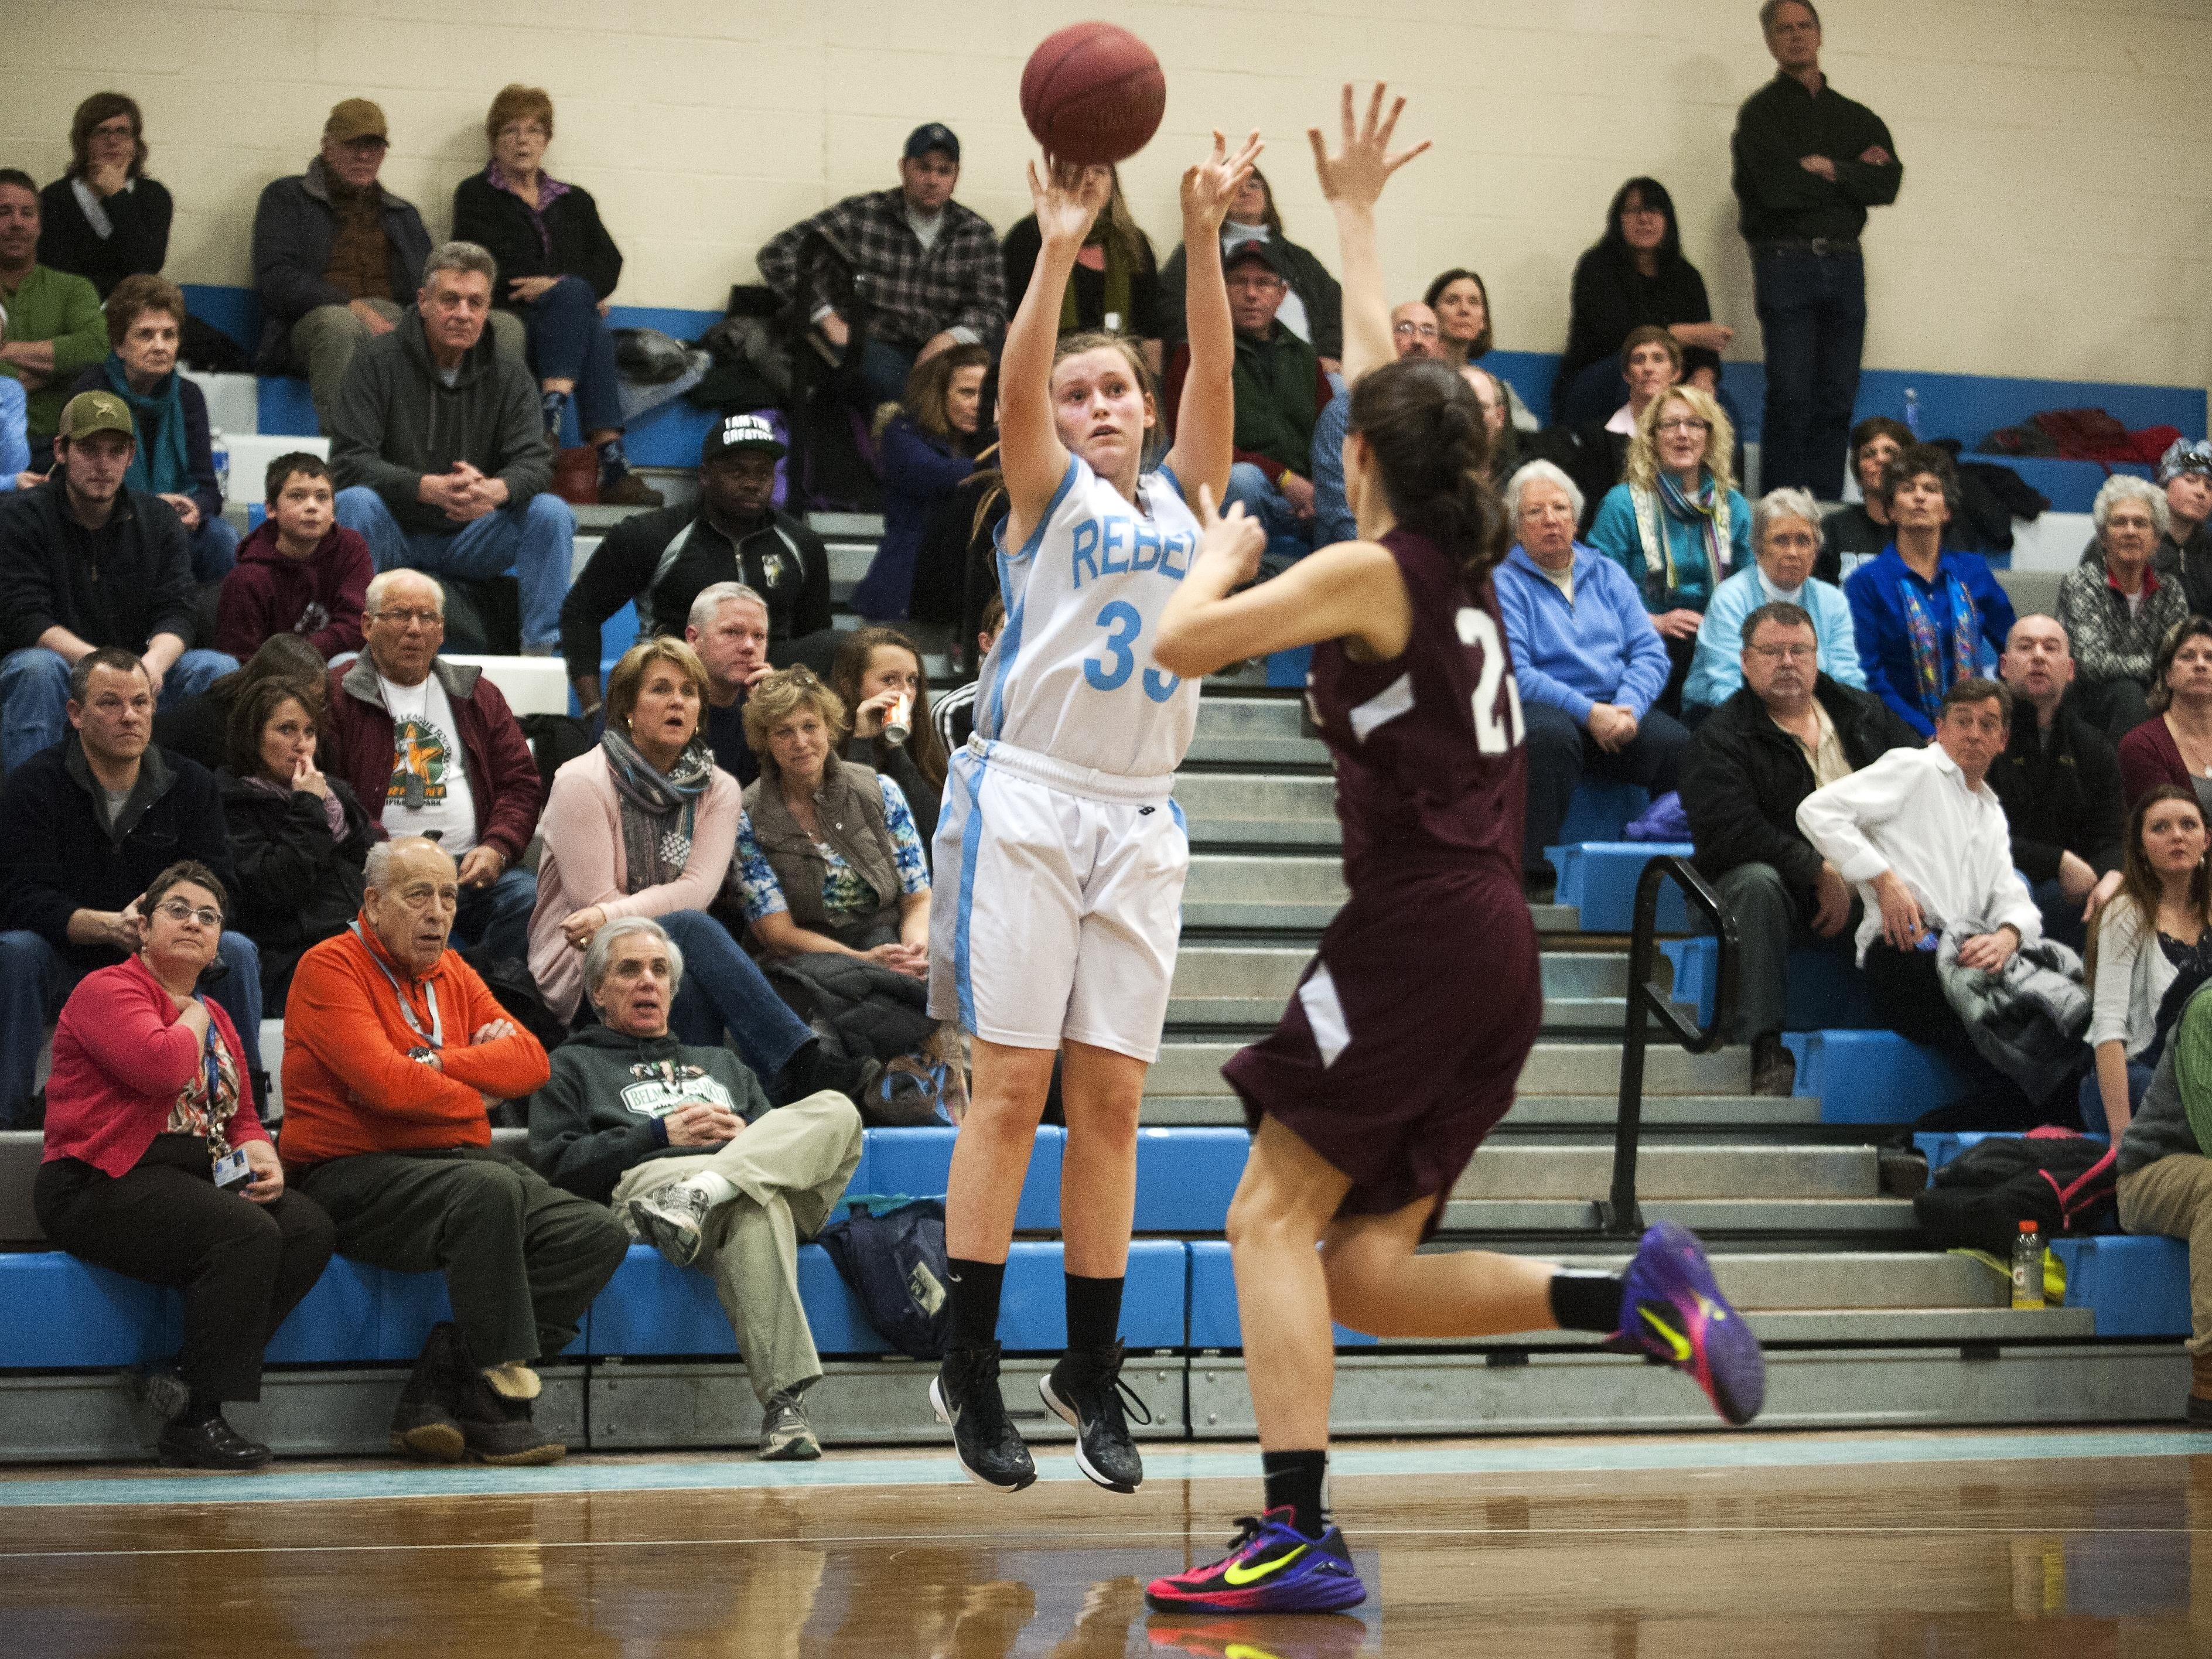 South Burlington's Emma MacDonough (33) takes a 3-point shot during a high school girls basketball game last year.